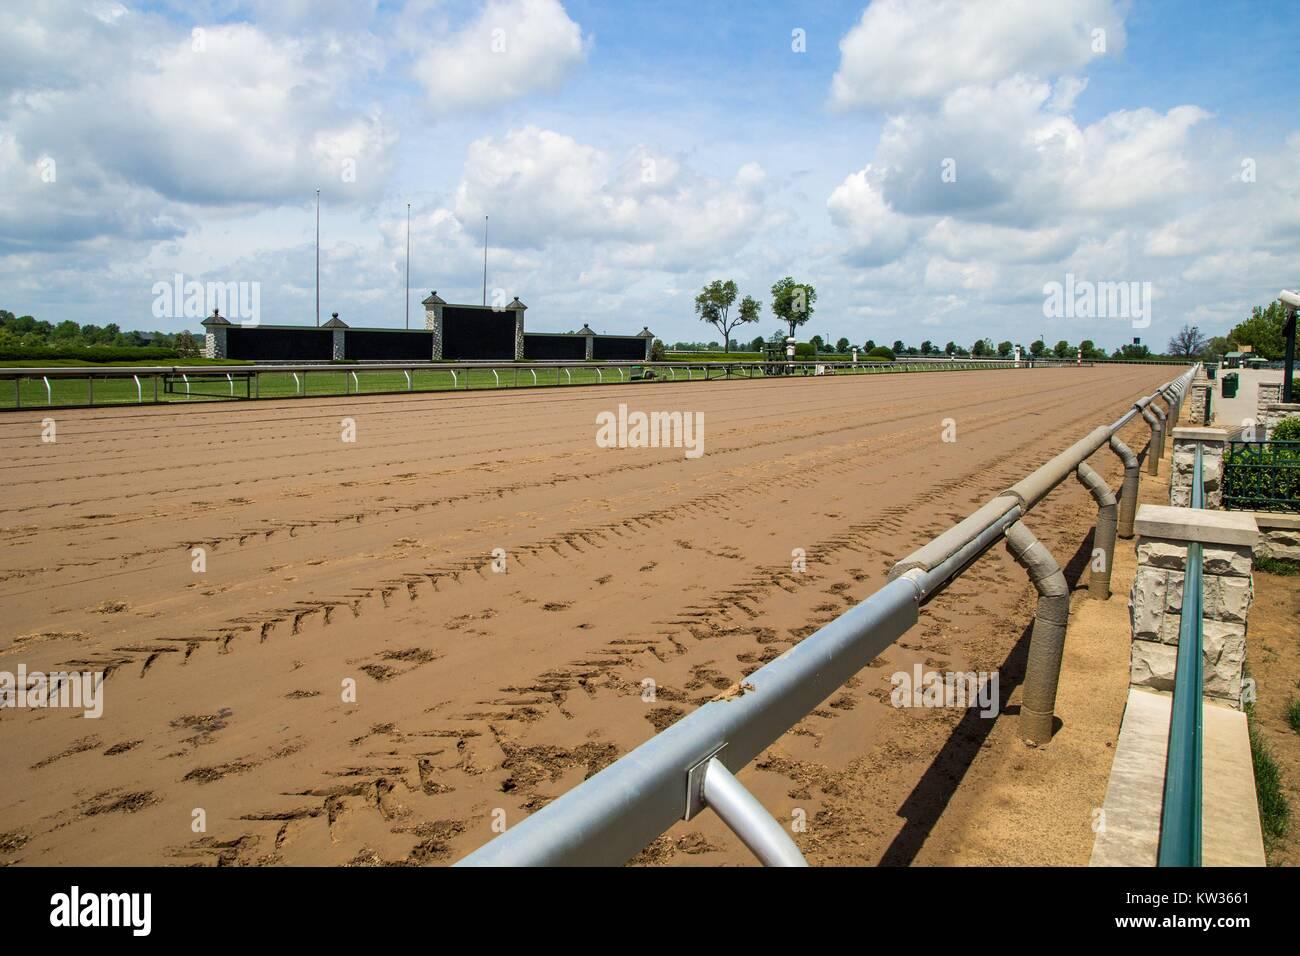 Lexington, Kentucky. USA. June 1, 2015. Keeneland racetrack in Lexington, Kentucky prepares to host the 2015 Breeders - Stock Image